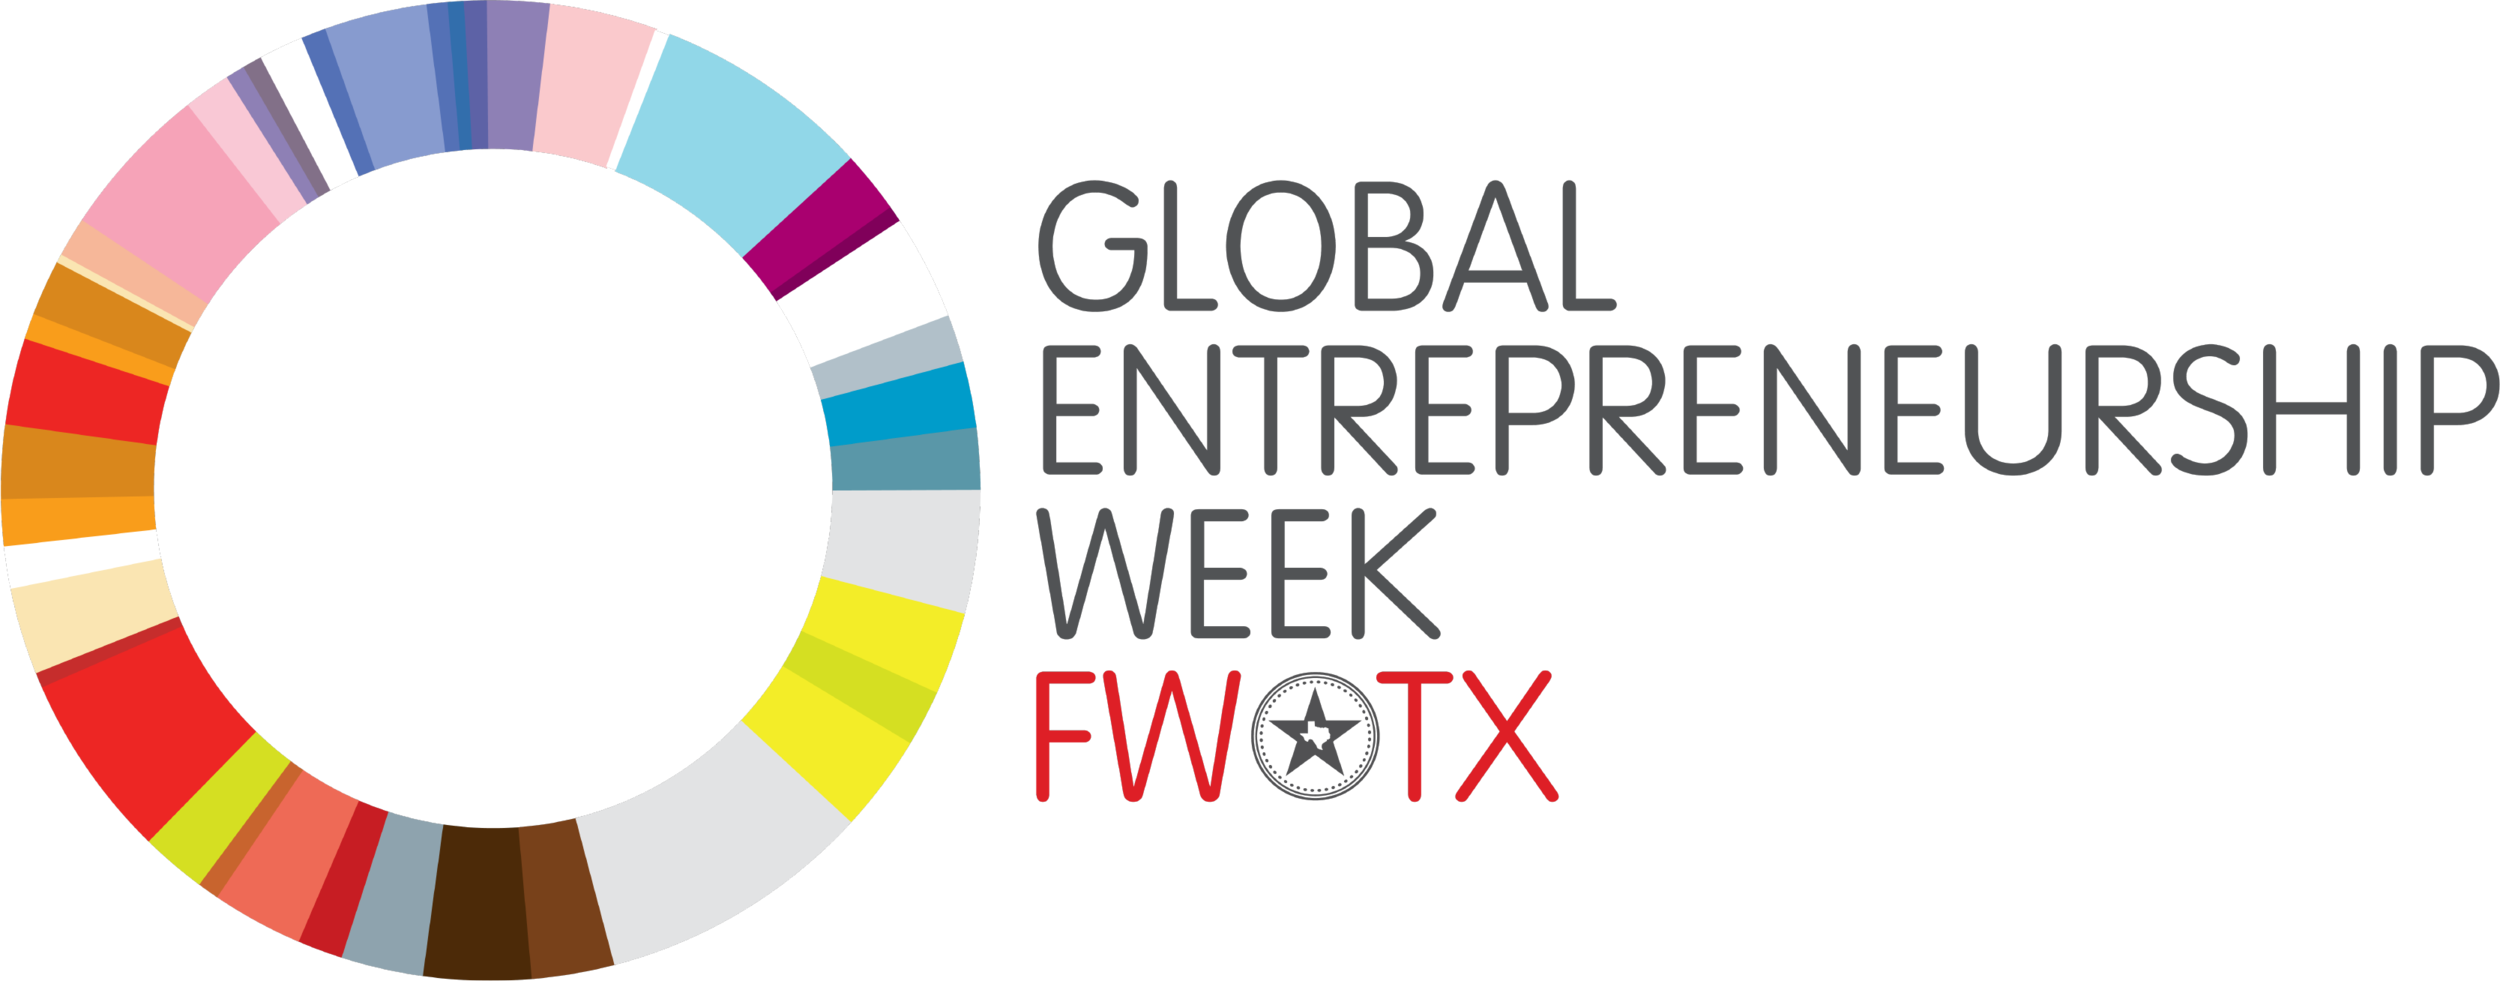 gewfw logo.png